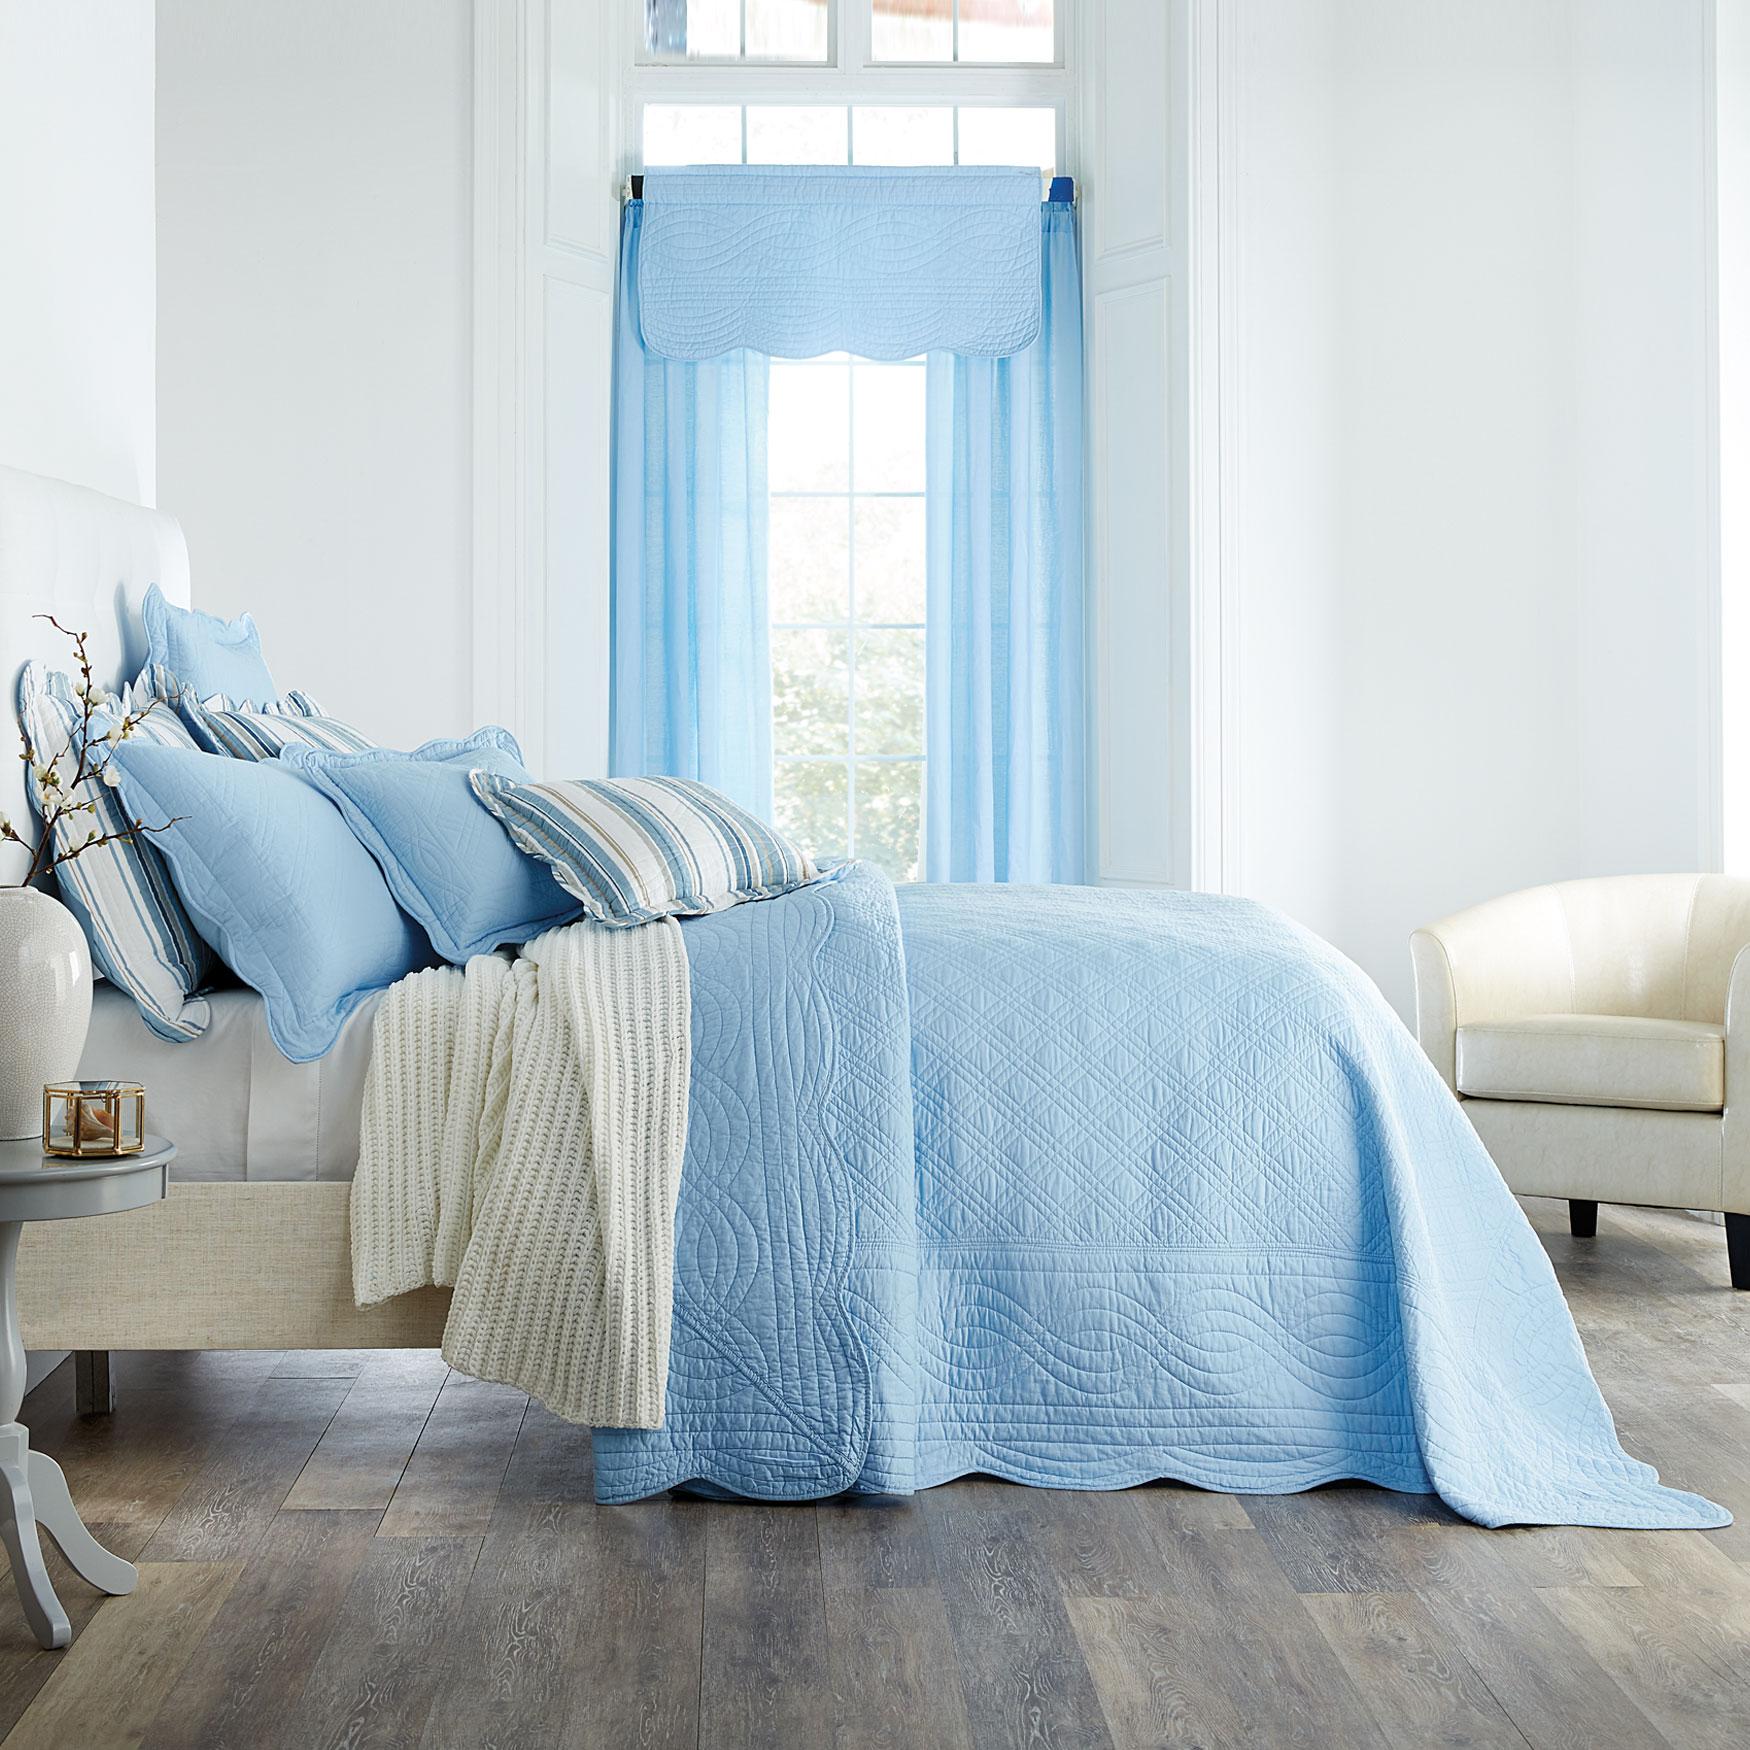 Florence Oversized Bedspread